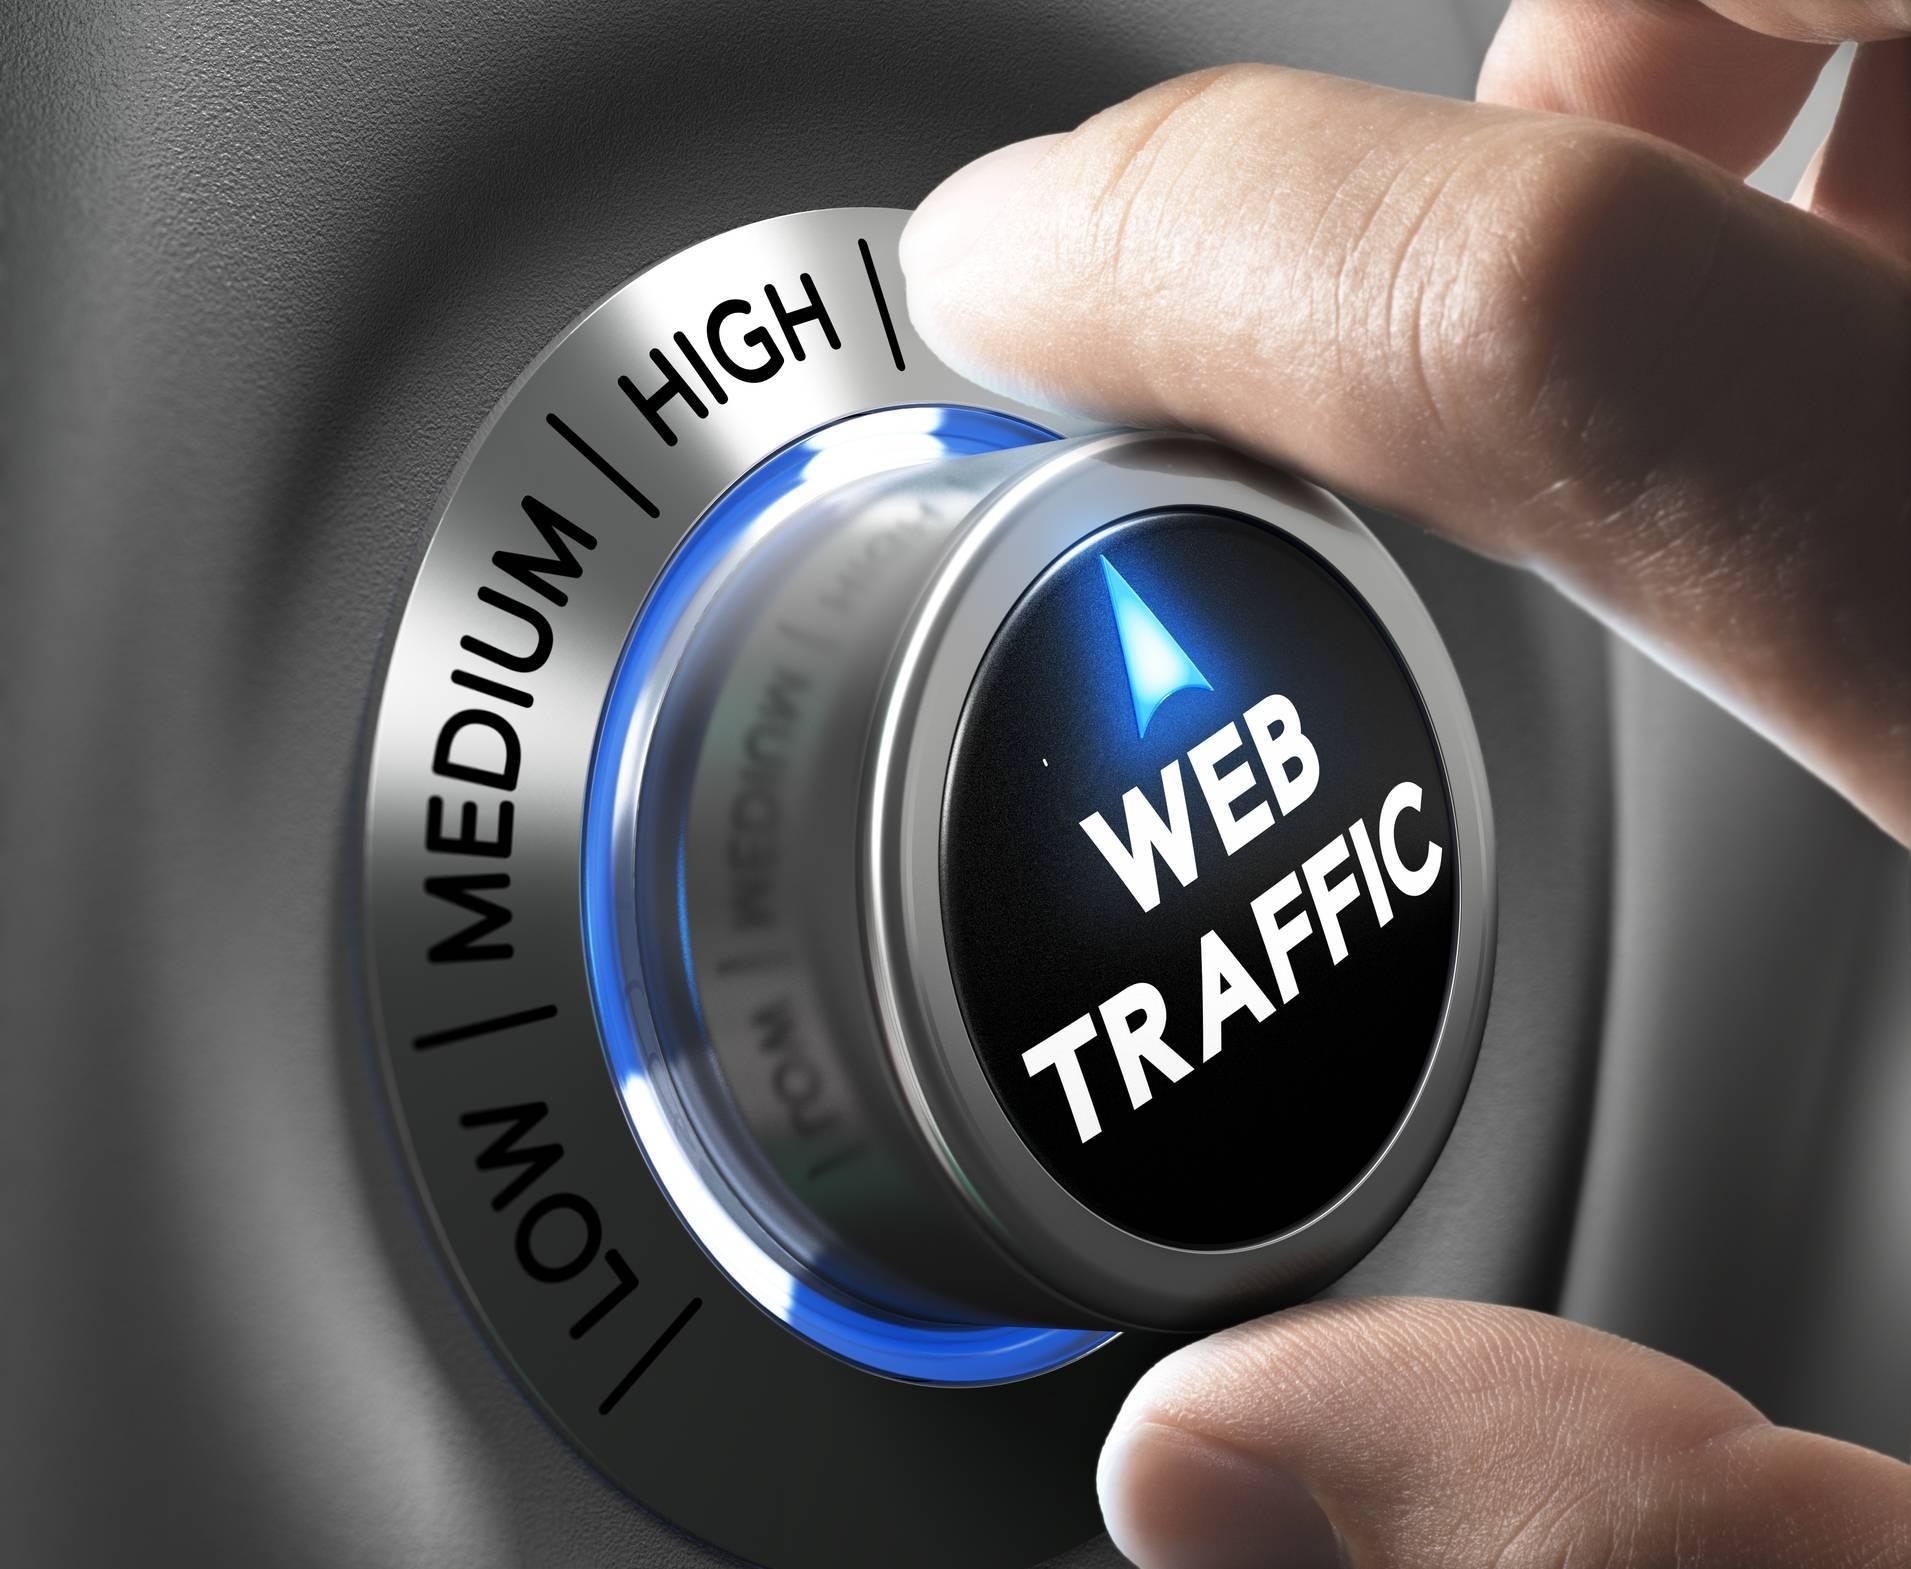 optimisation du trafic grâce au seo